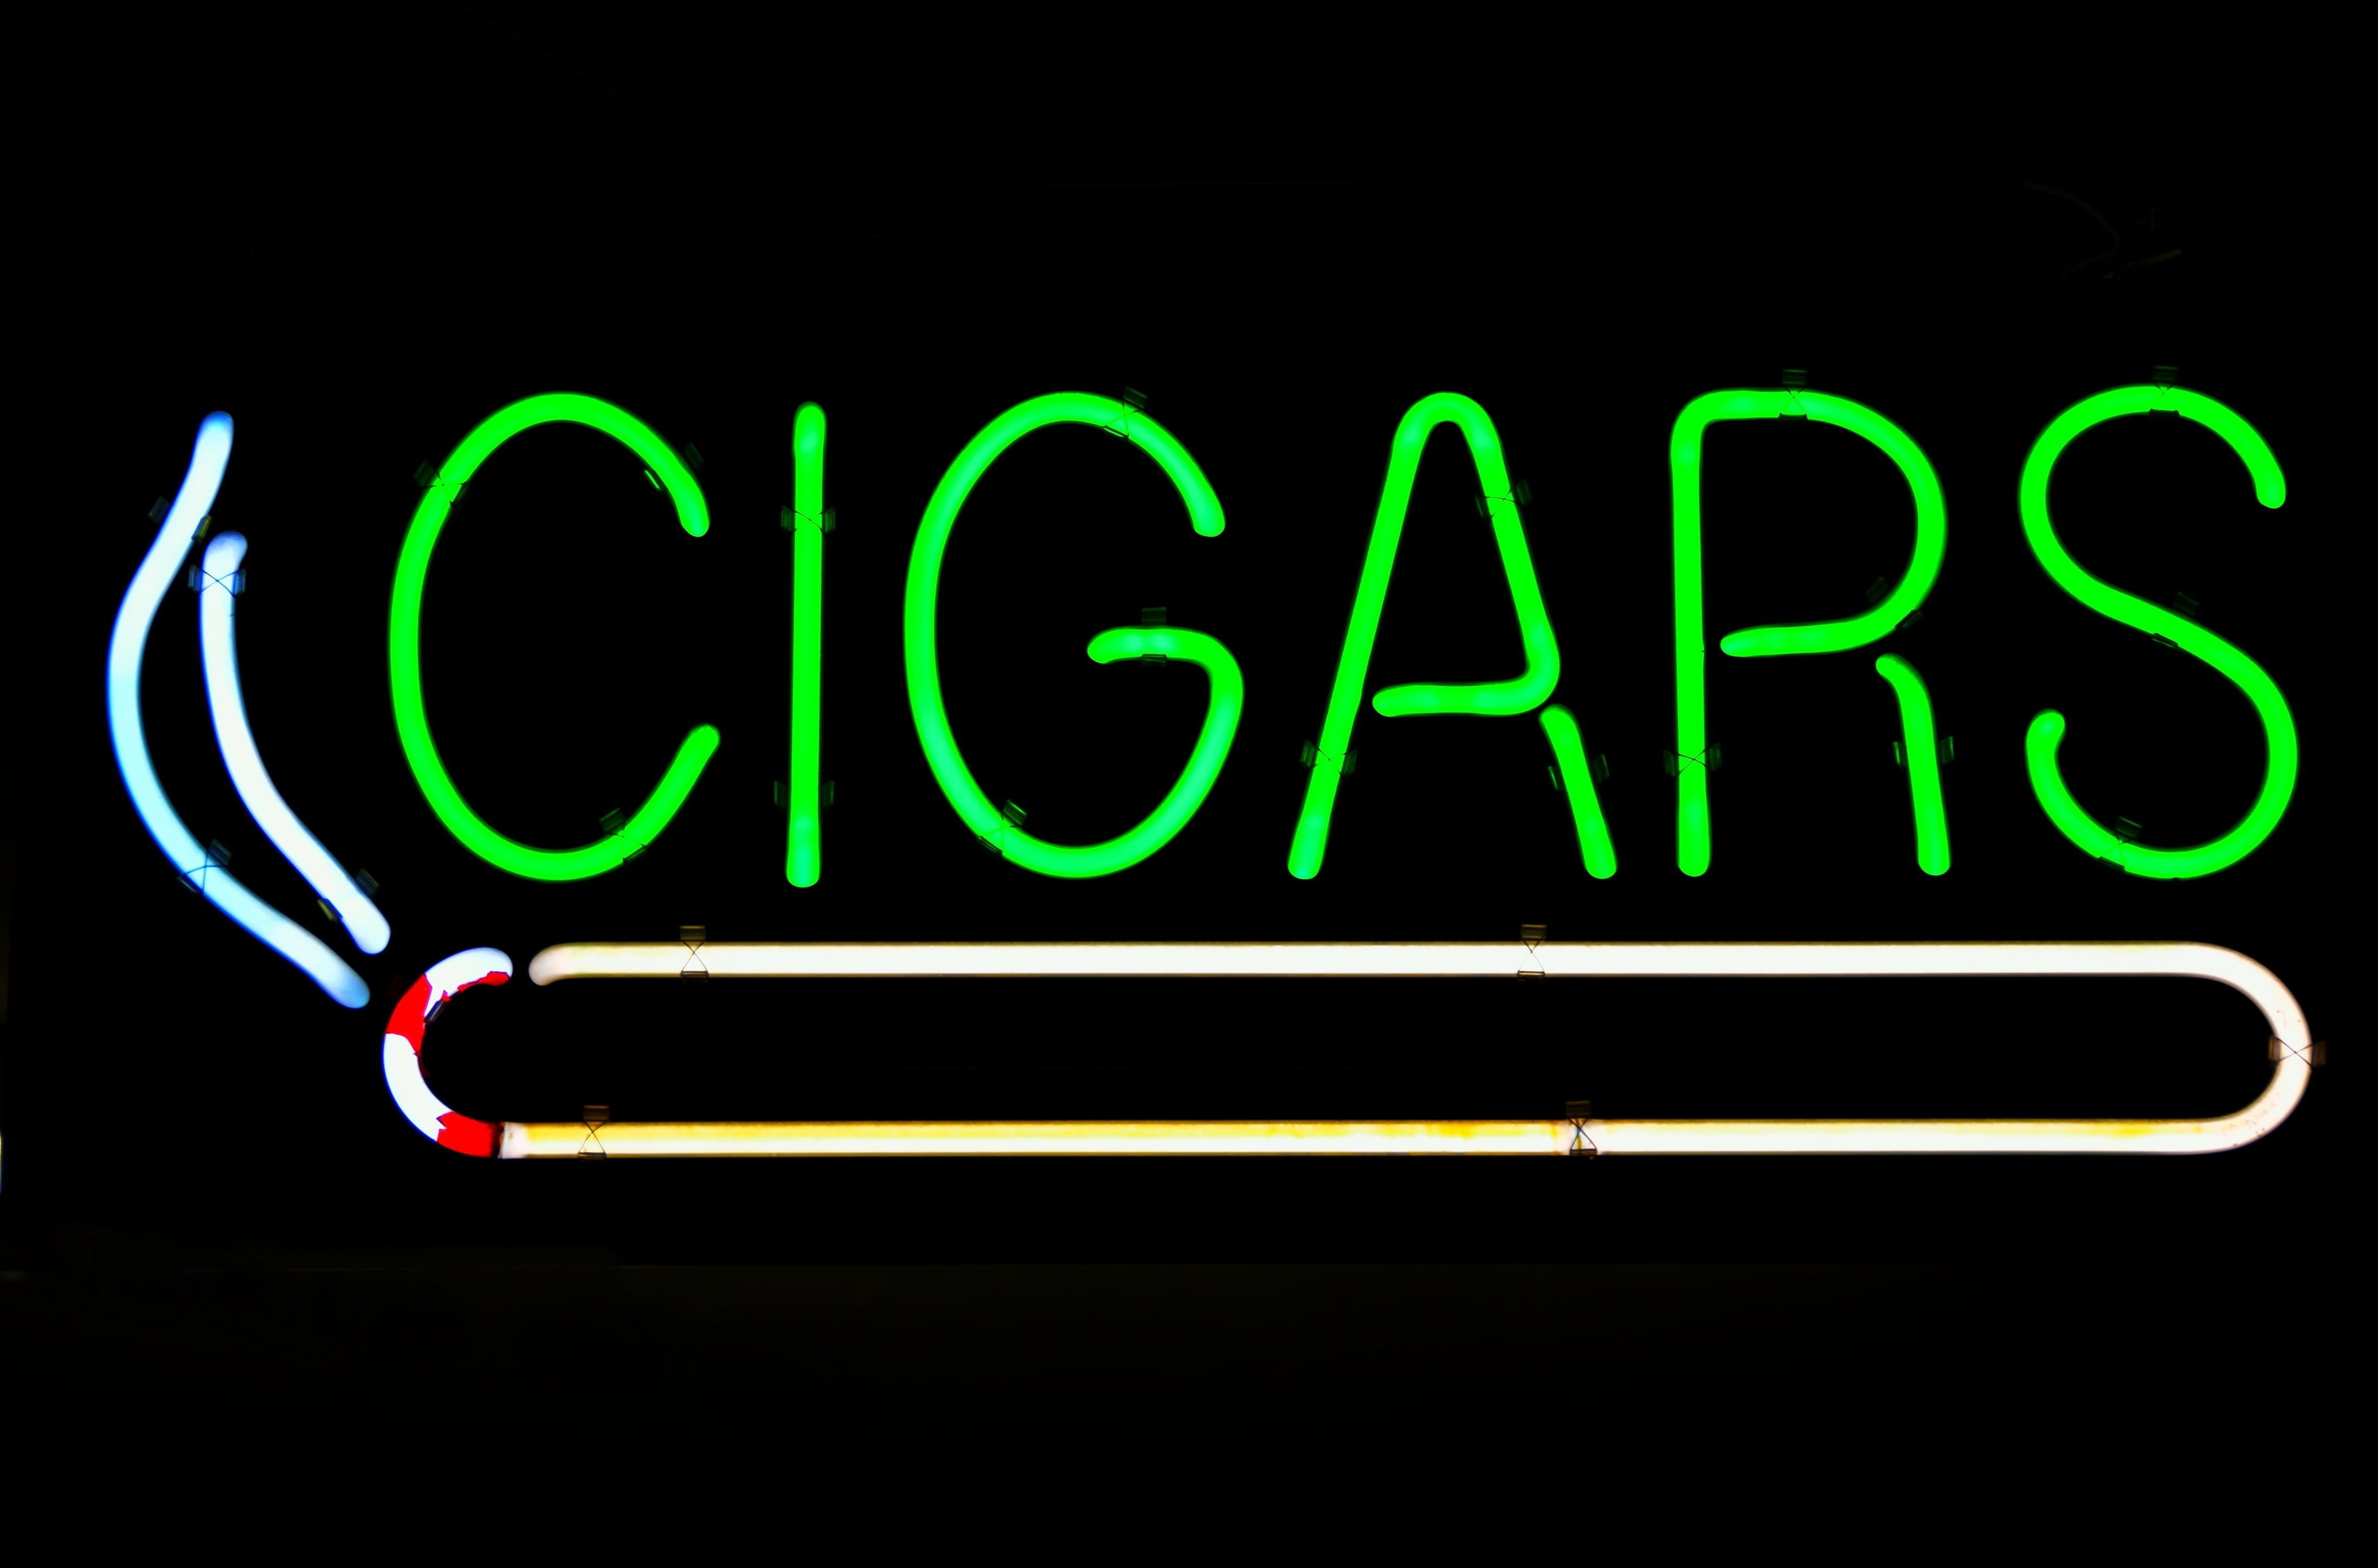 Free stock photo of light, sign, cigar, display